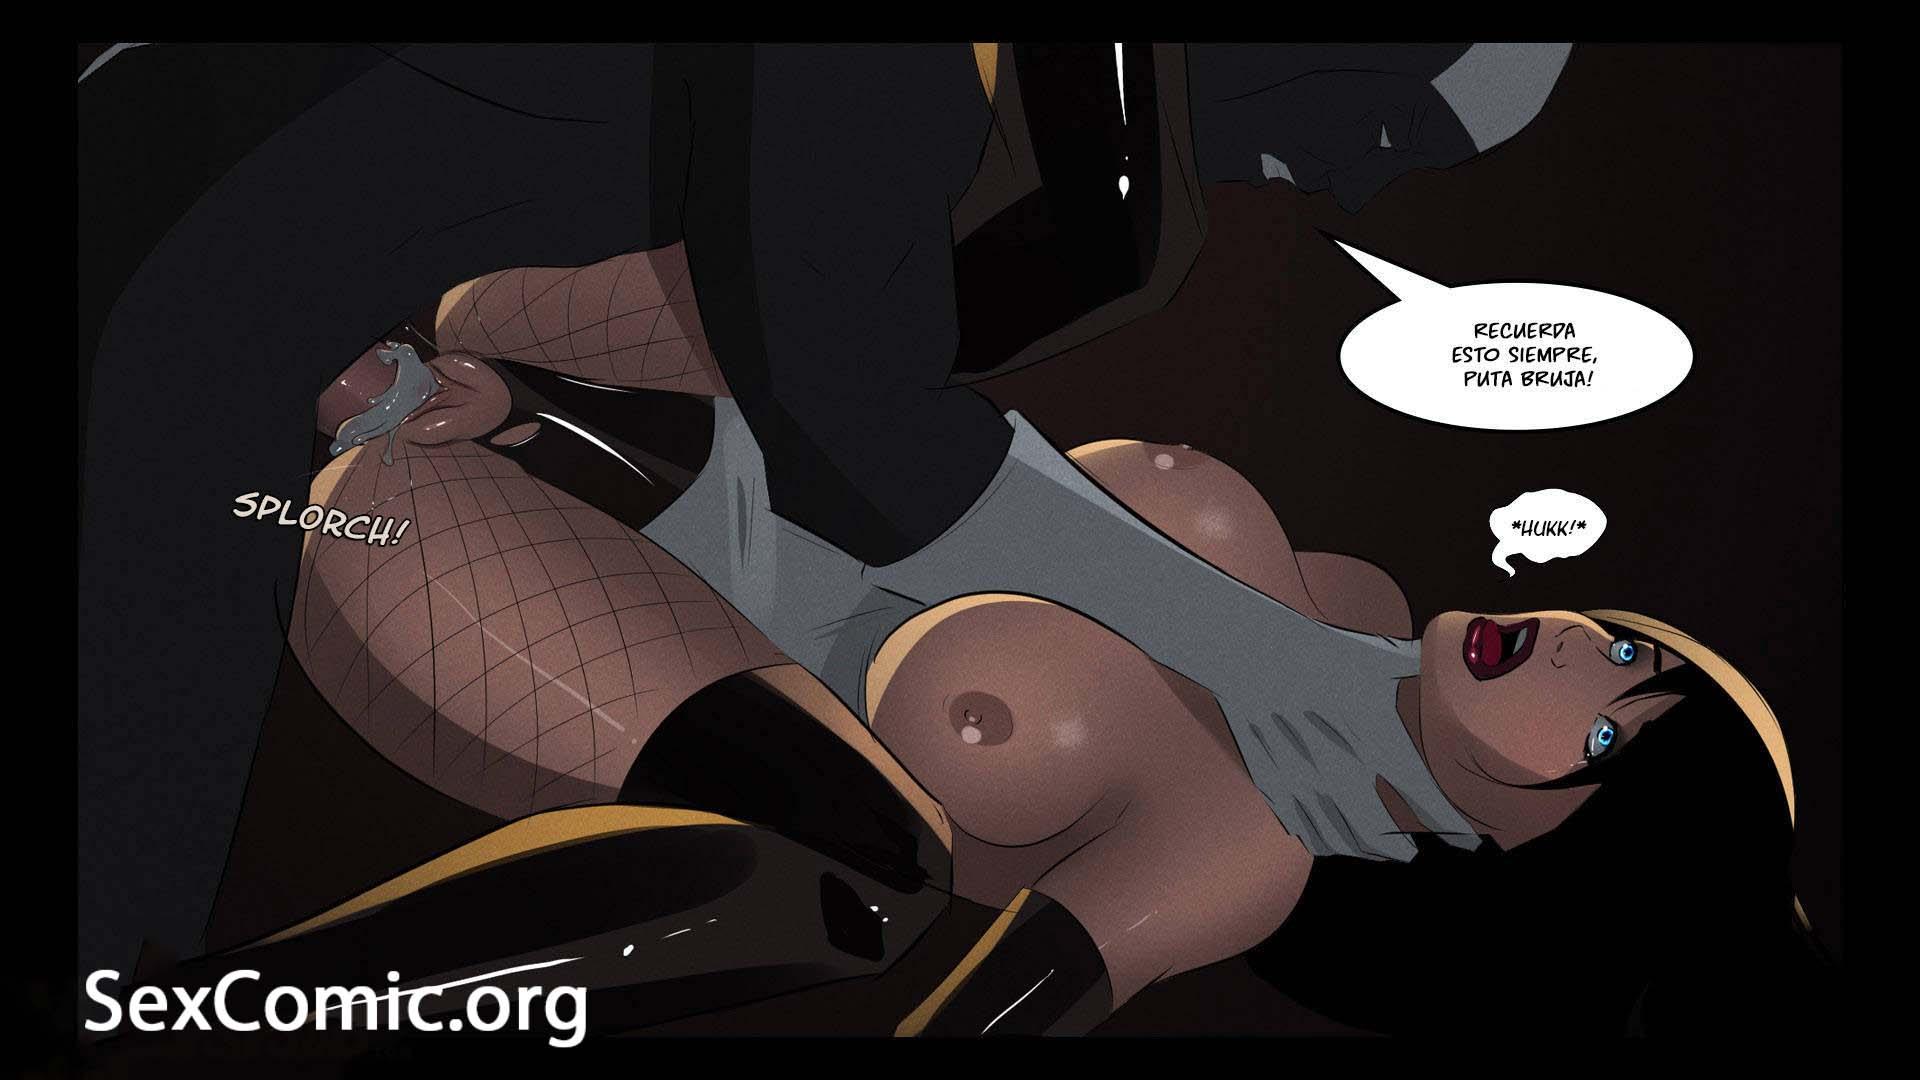 comics-marvel-xxx-vengandose-de-zatana-mangas-para-adultos-fantasias-sexuales-hentai-videos-porno-gratis-comics-de-zoofilia-comics-incesto-19